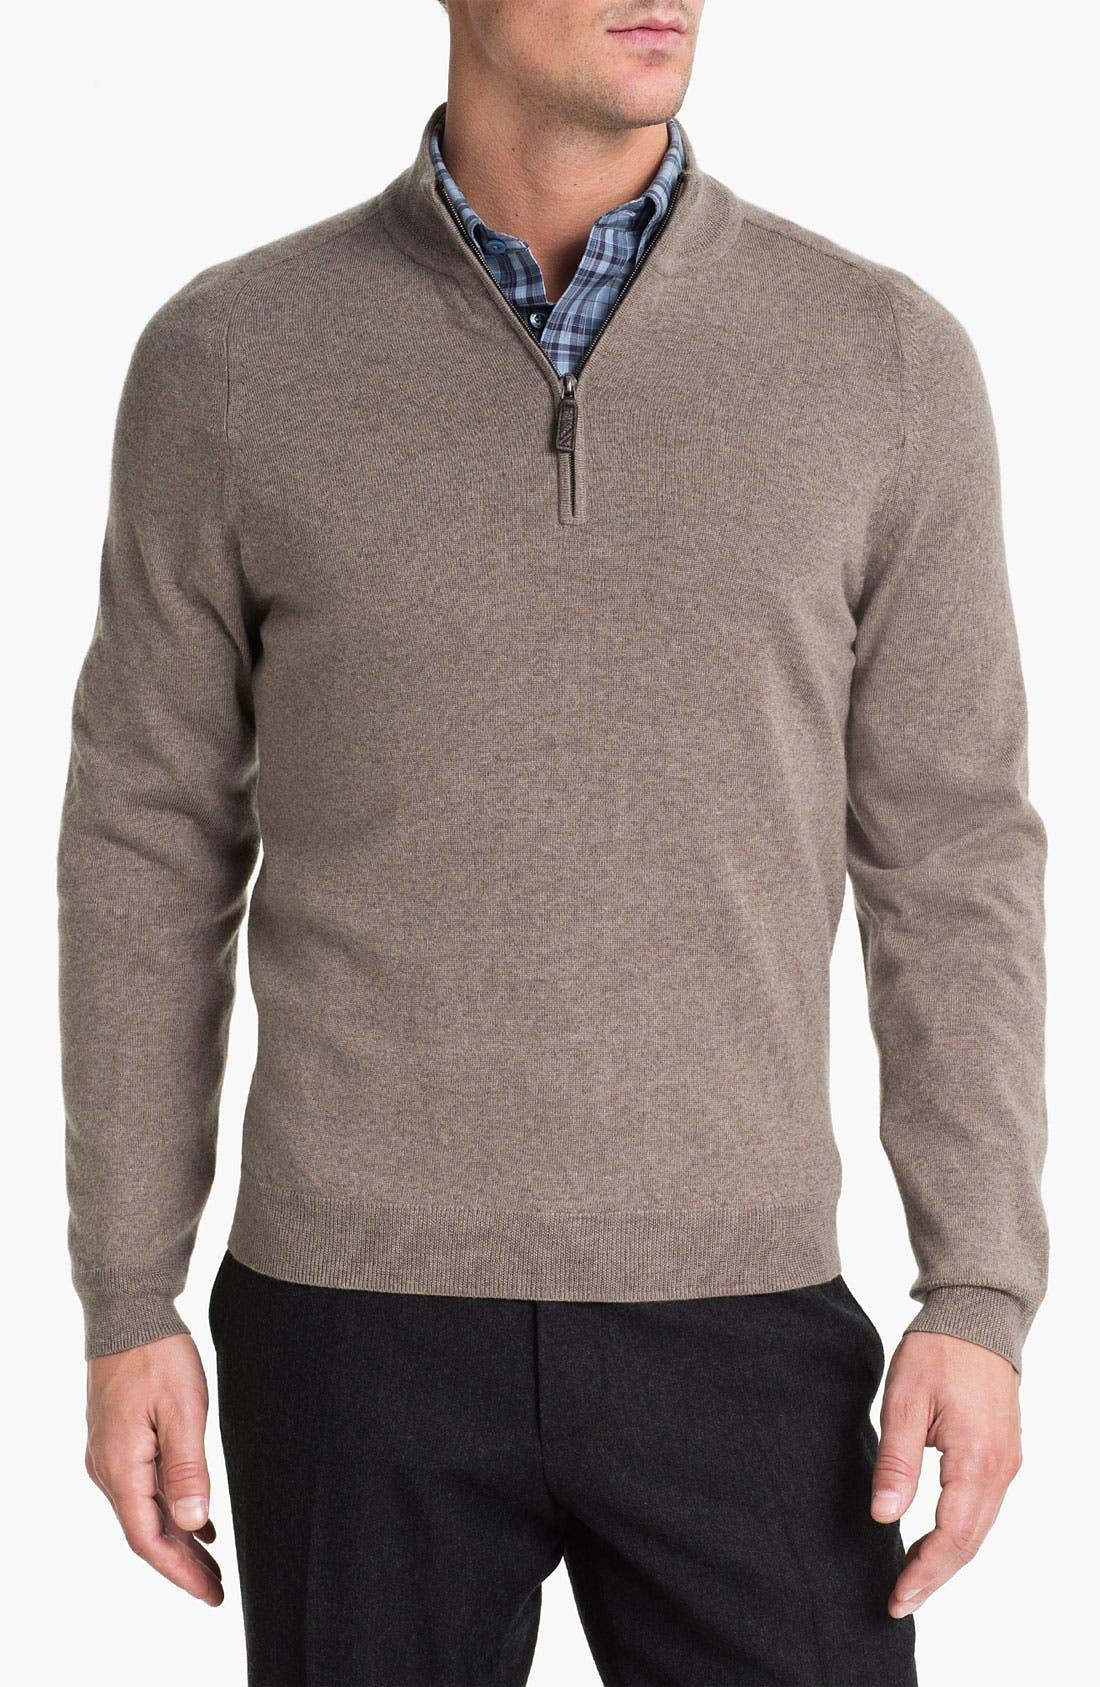 Alternate Image 1 Selected - Nordstrom Merino Wool Half Zip Sweater